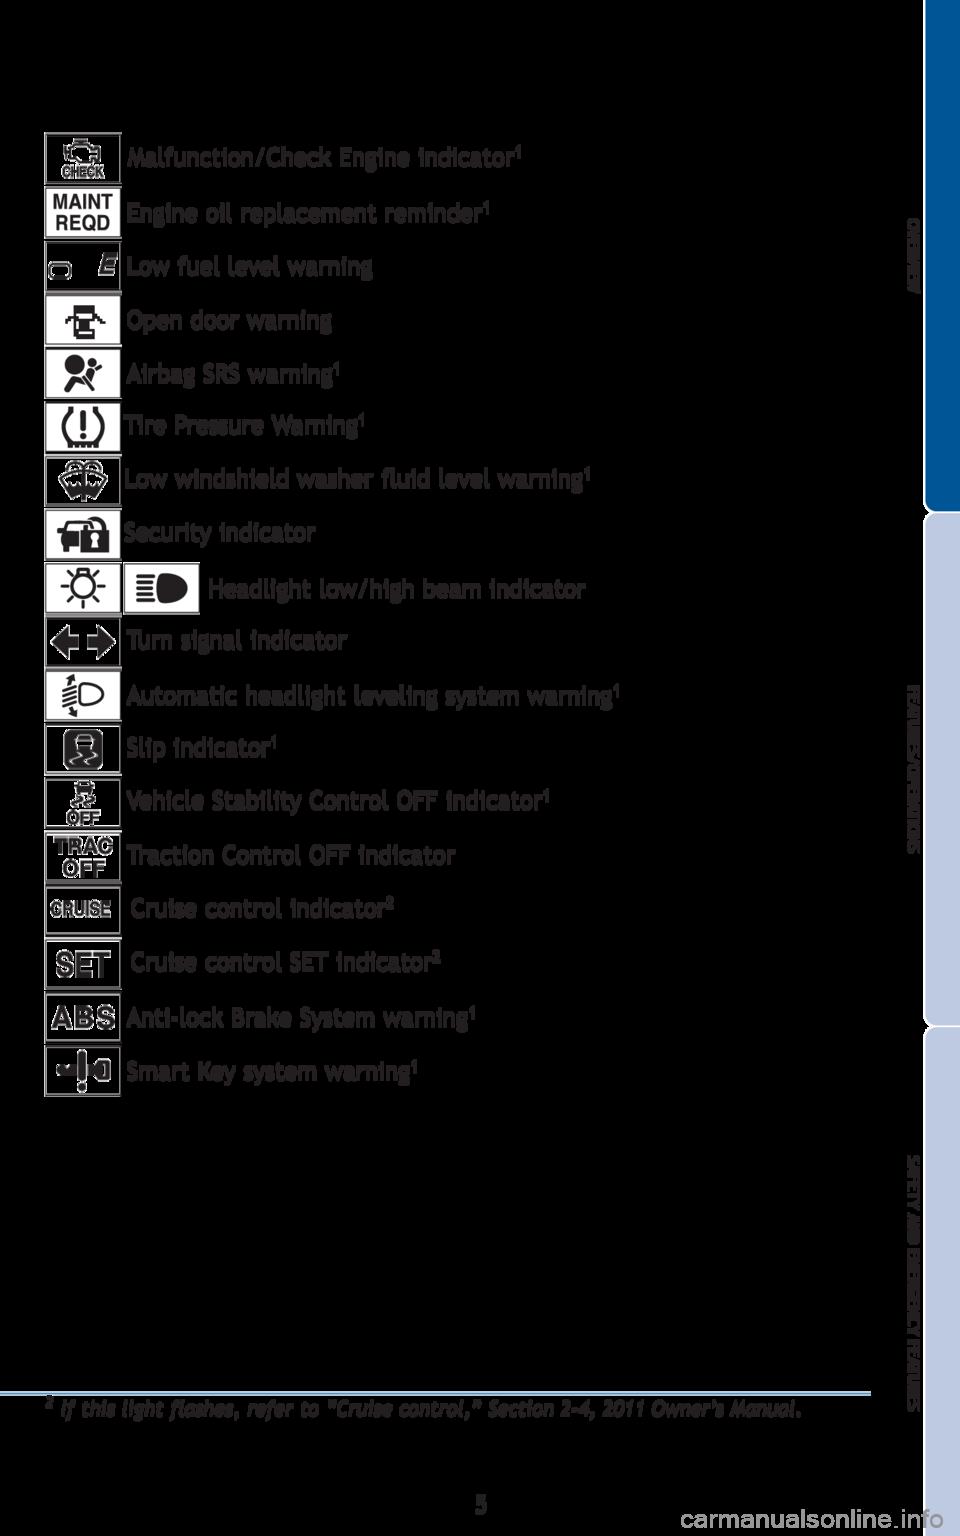 Sienna toyota sienna dashboard warning symbols toyota sienna toyota avalon 2011 xx30 3g quick reference guide buycottarizona Gallery